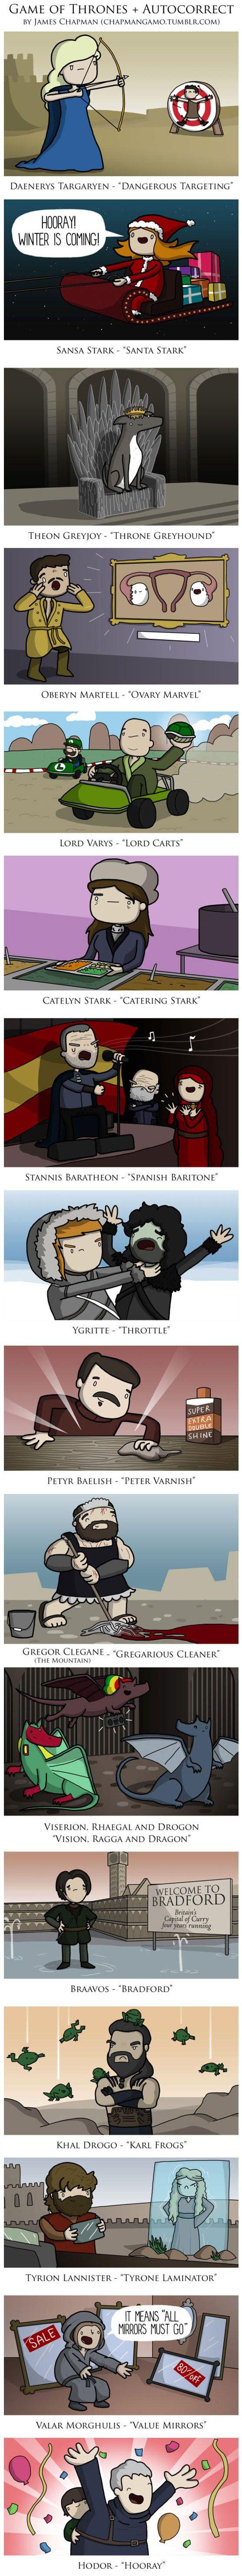 Game of Thrones autocorrect.